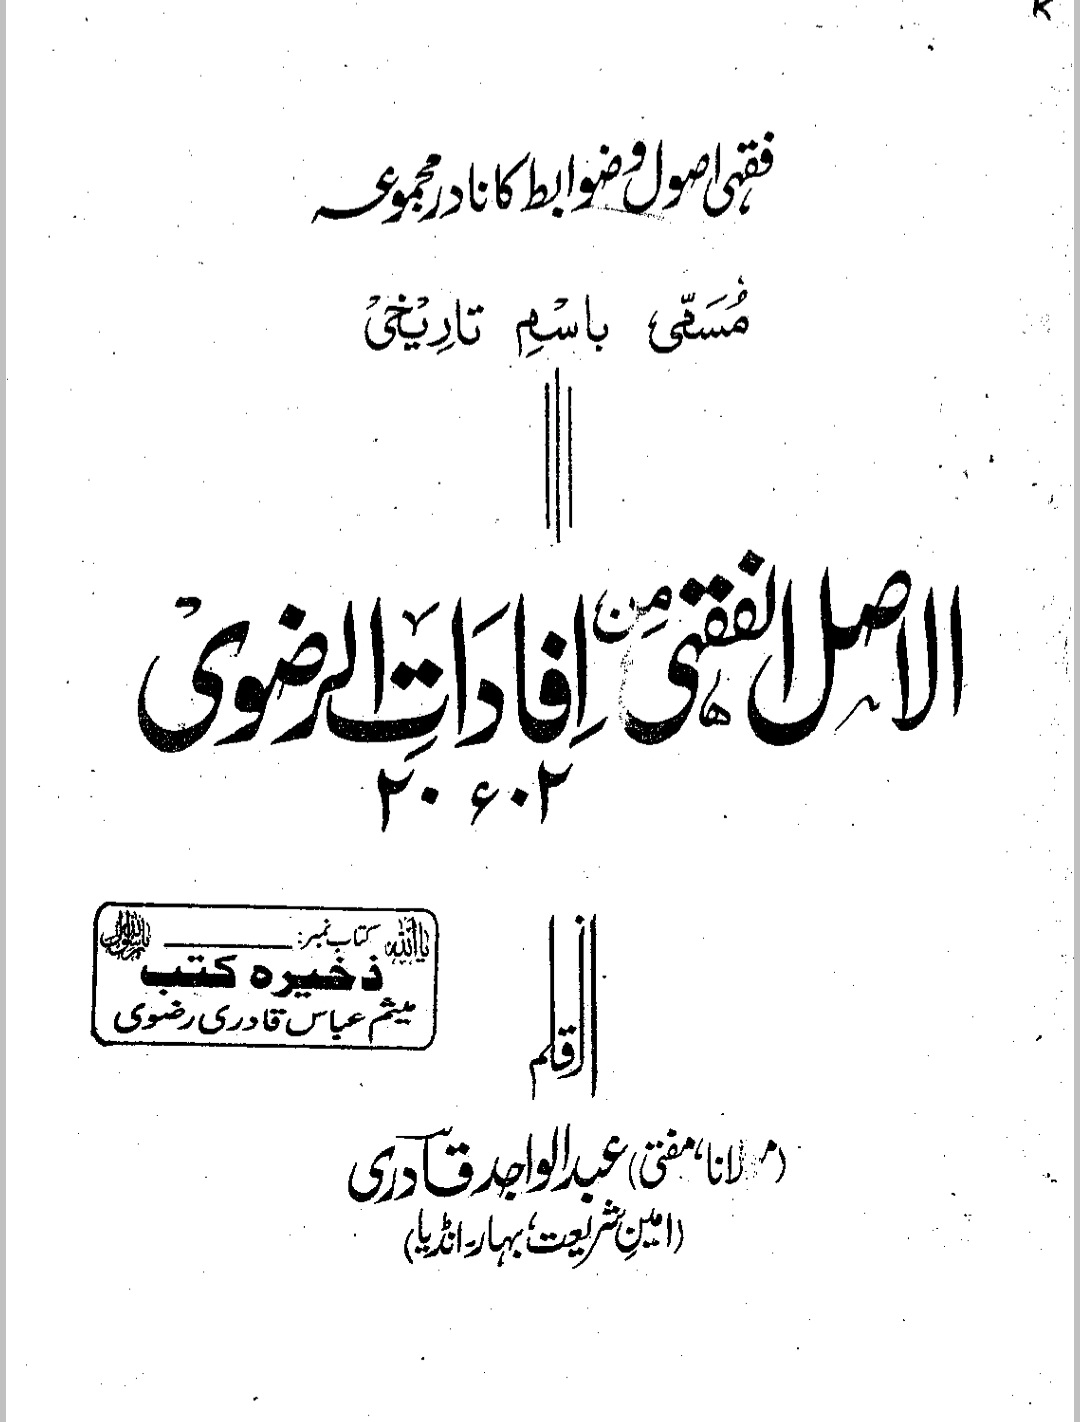 Al Asal Ul Fuqhai Min Ifadat Al Razavi / الاصل الفقہی من افادات الرضویby مفتی عبدالواجد قادری